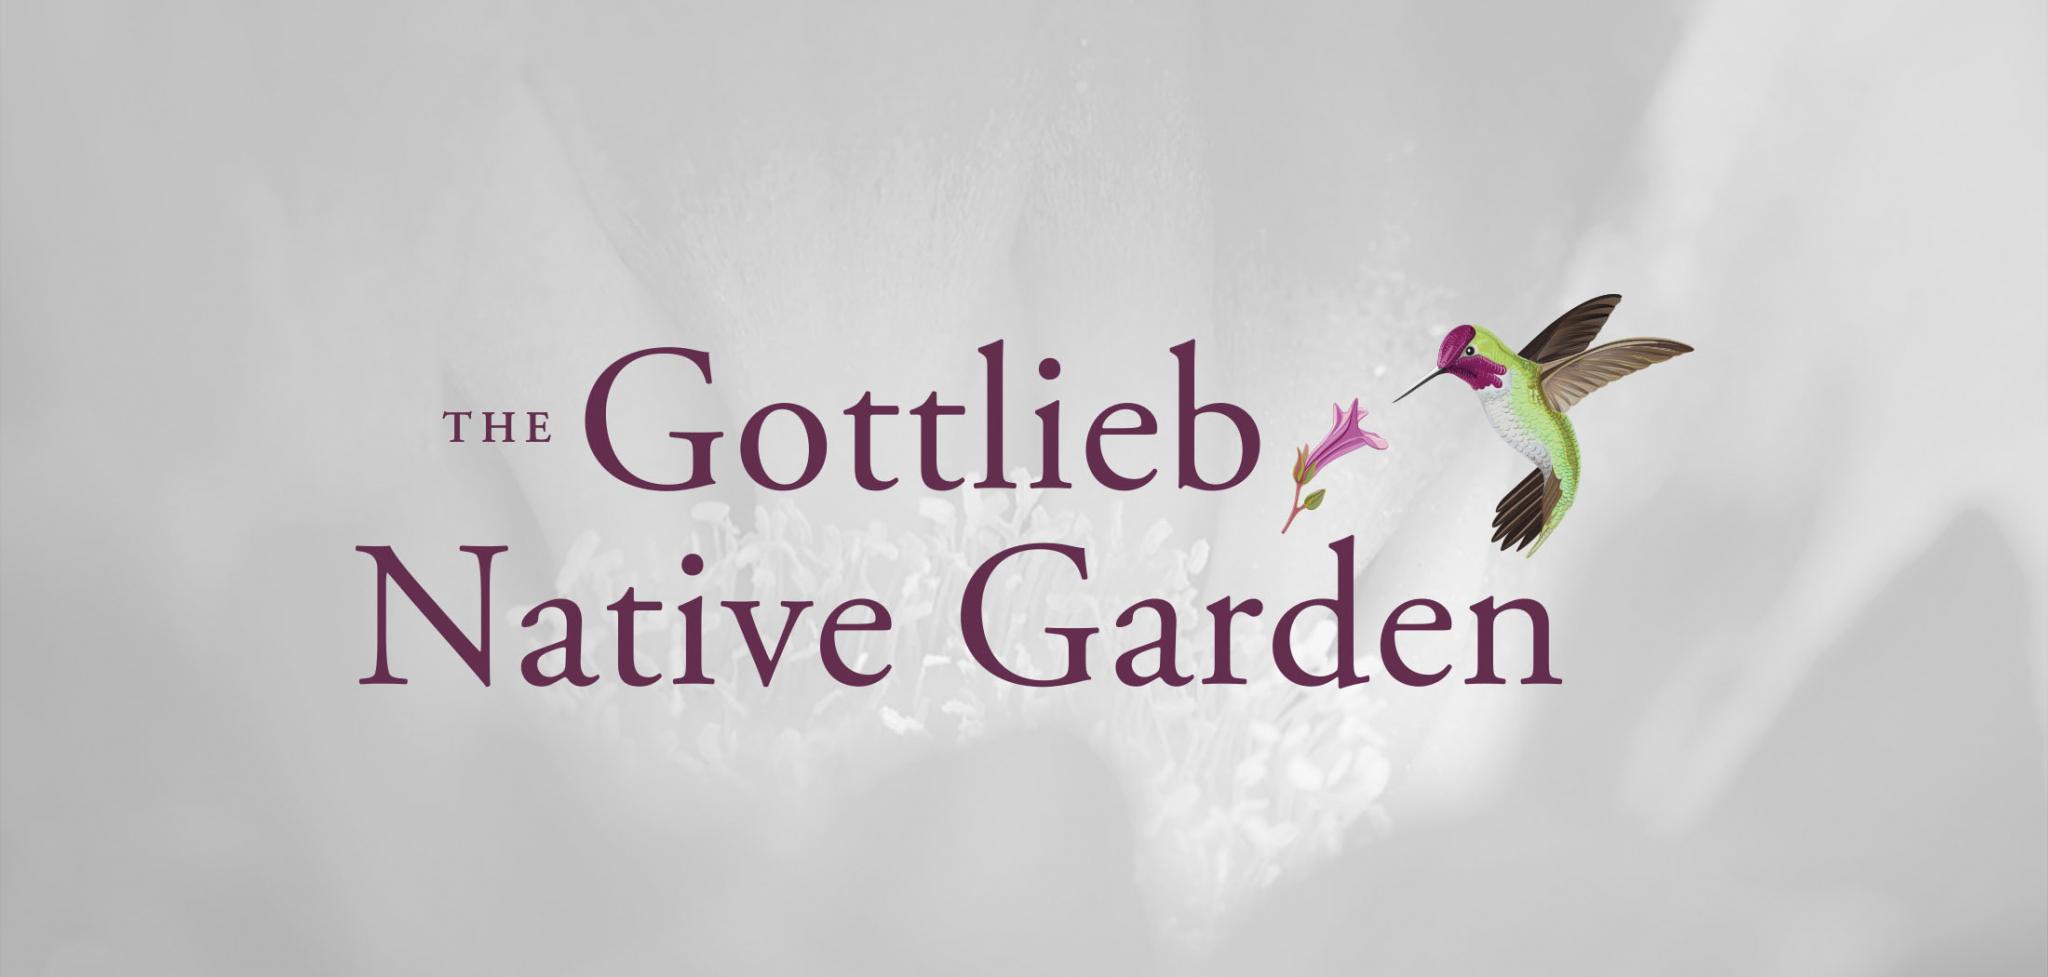 Eco Branding Logo Design for the Gottlieb Native Garden